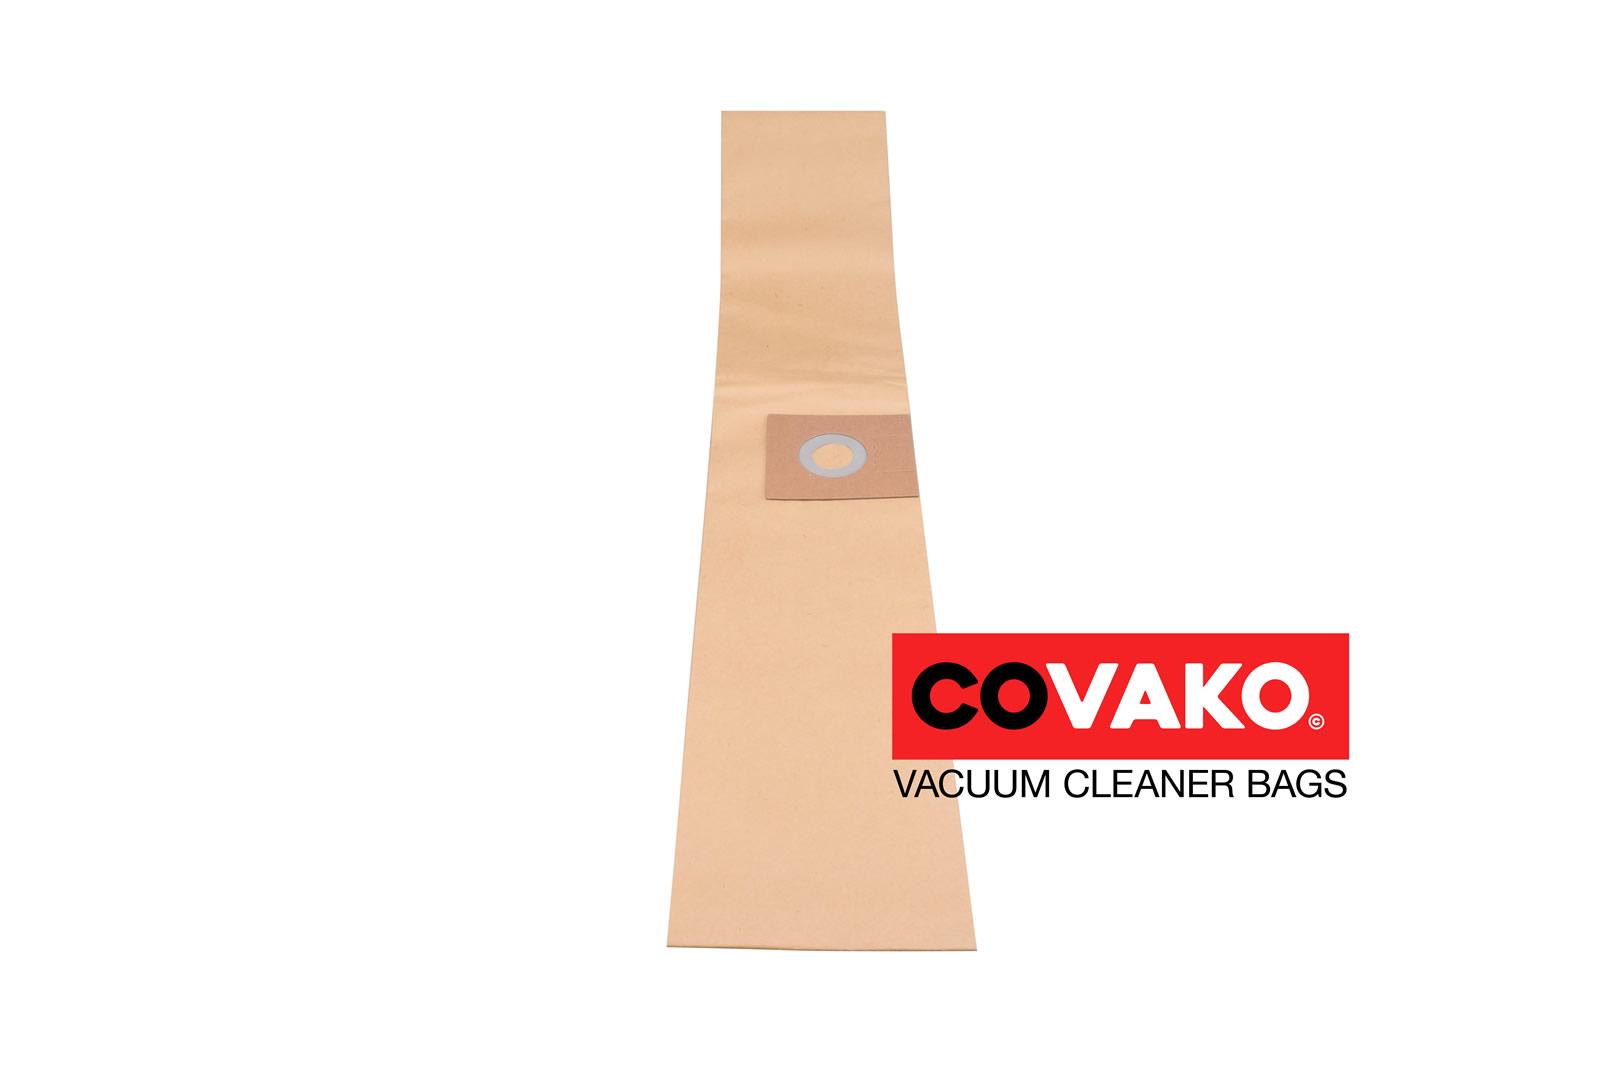 Wirbel Mikros / Papier - Wirbel sacs d'aspirateur